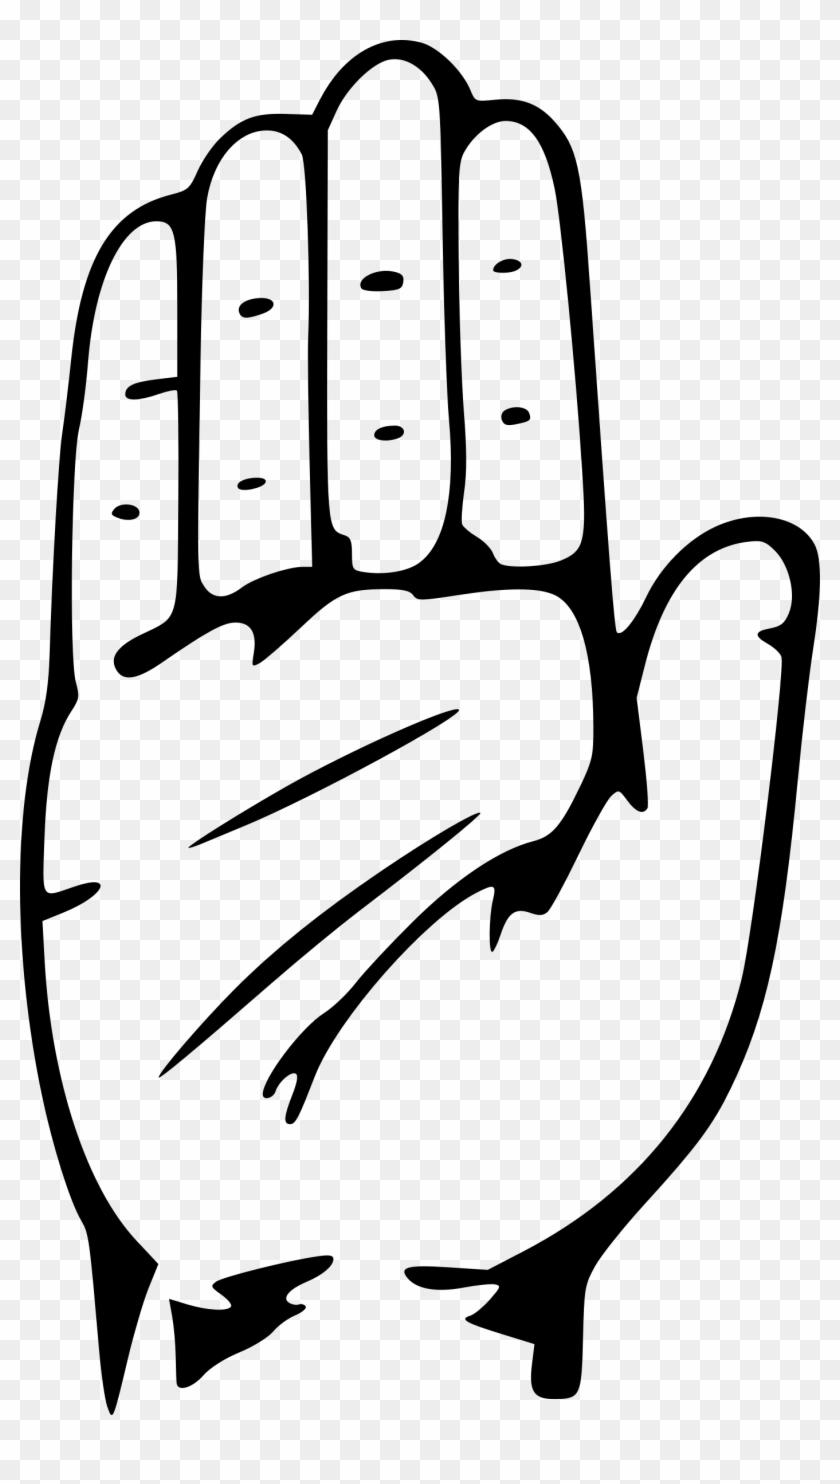 big image indian national congress logo free transparent png rh clipartmax com congress loop trail congress loop trail sequoia national park